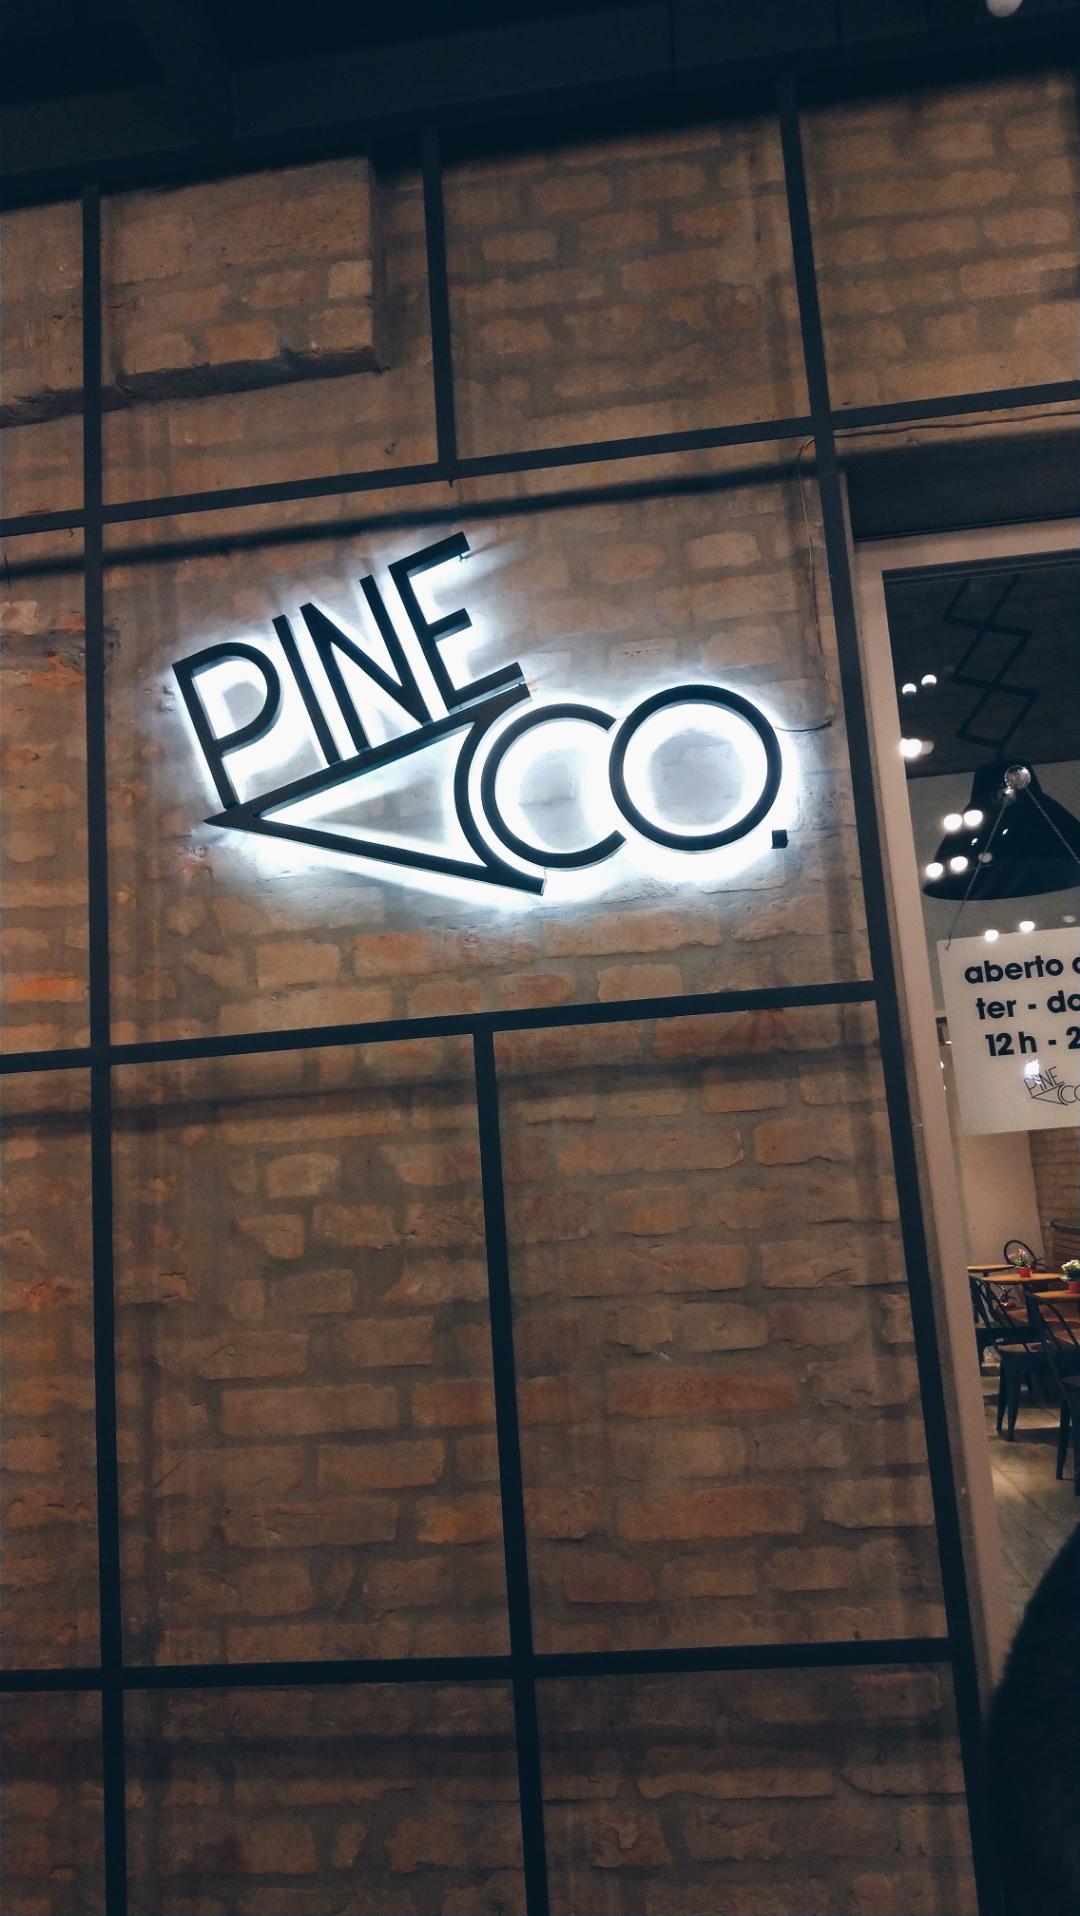 Pine Co.